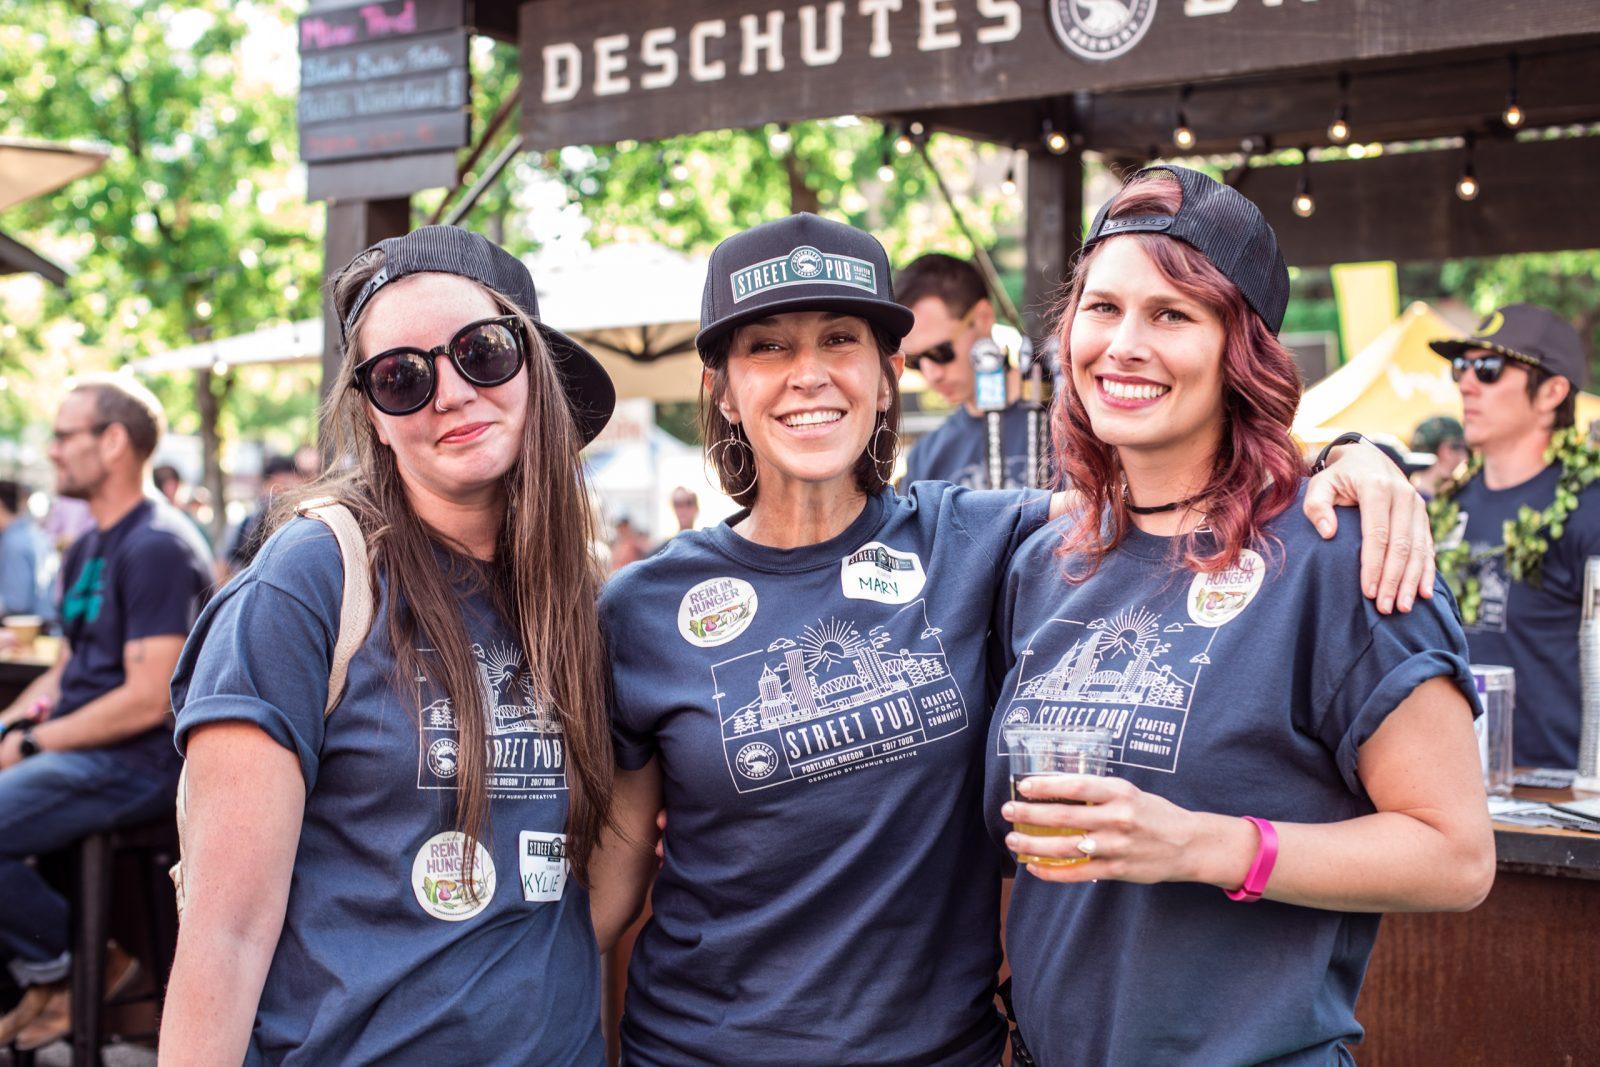 Street pub volunteer event